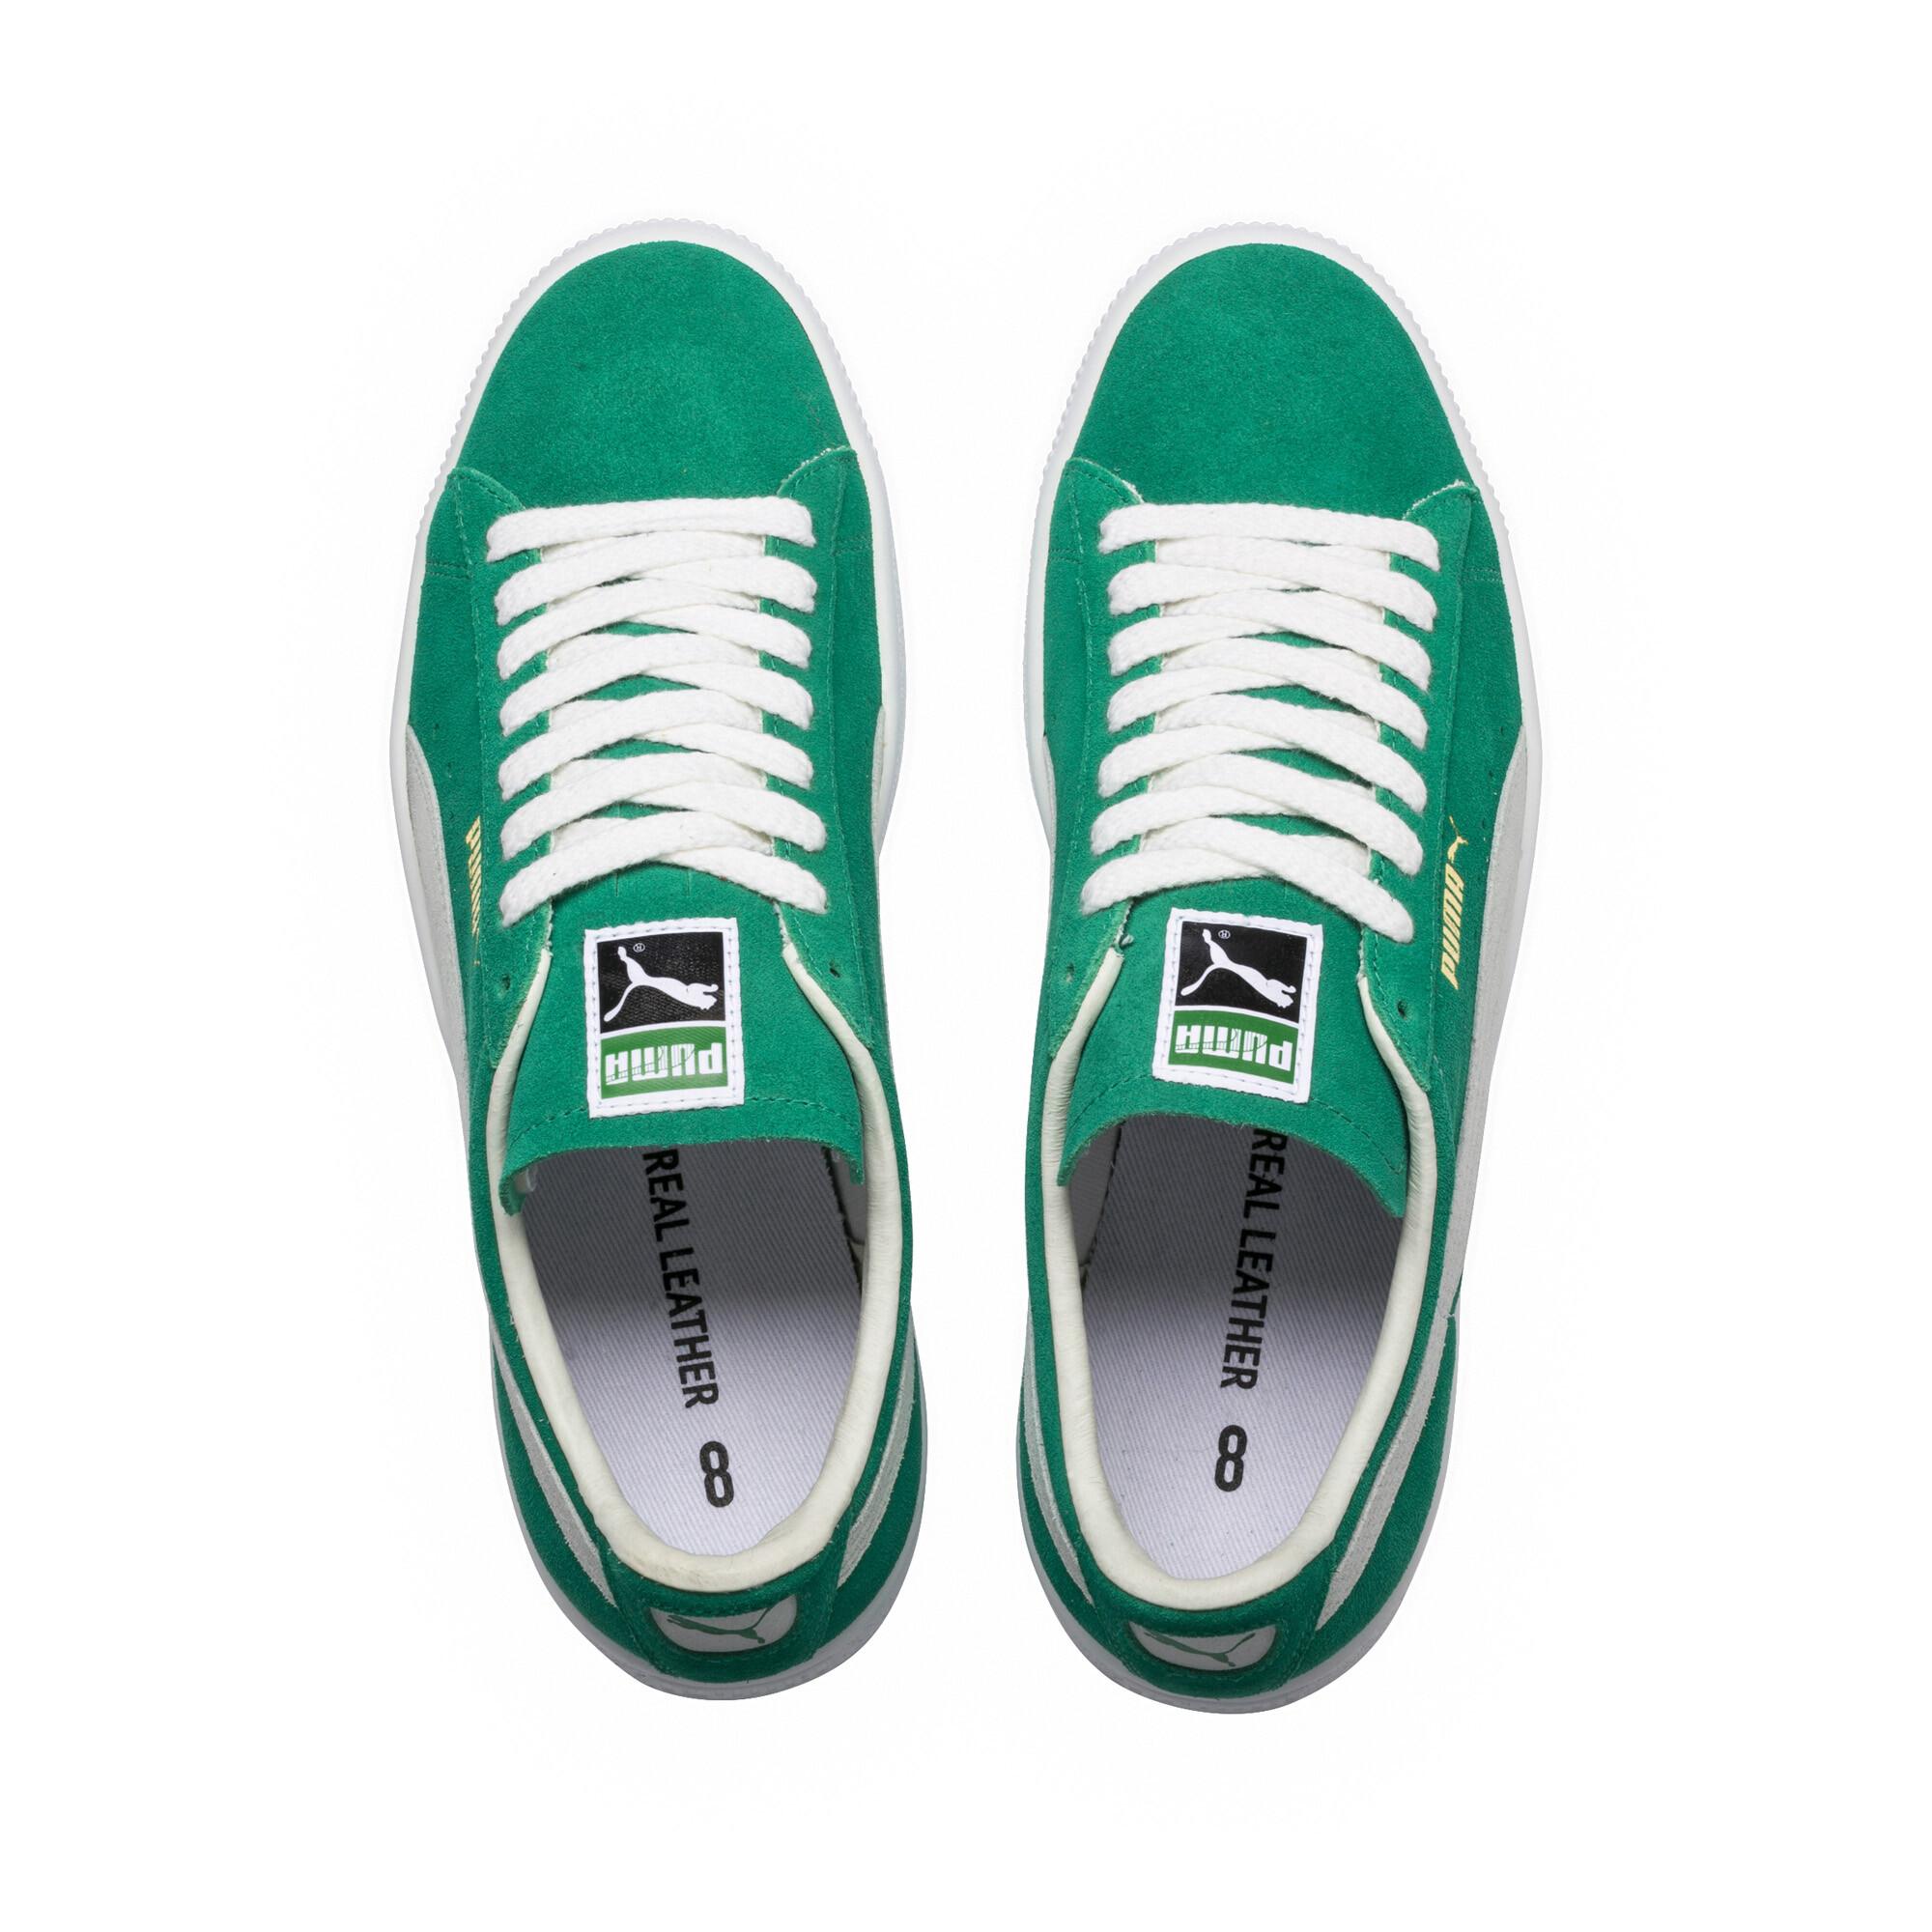 Image Puma Suede 90681 Sneakers #5